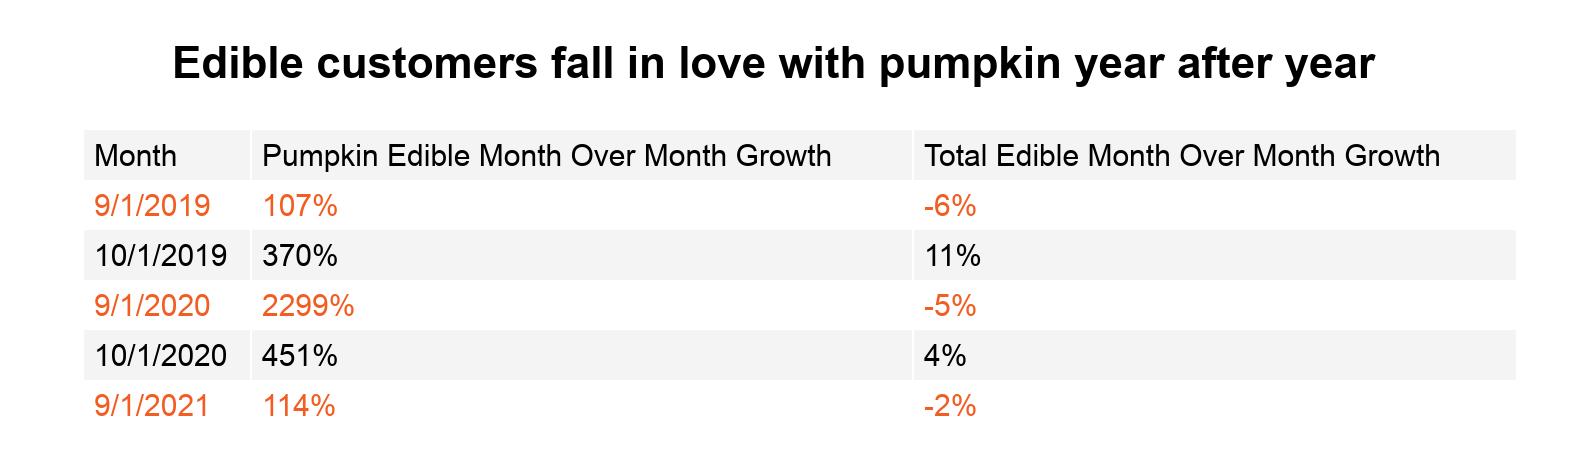 Cannabis edibles data & performance image 9: Pumpkin spice edible sales